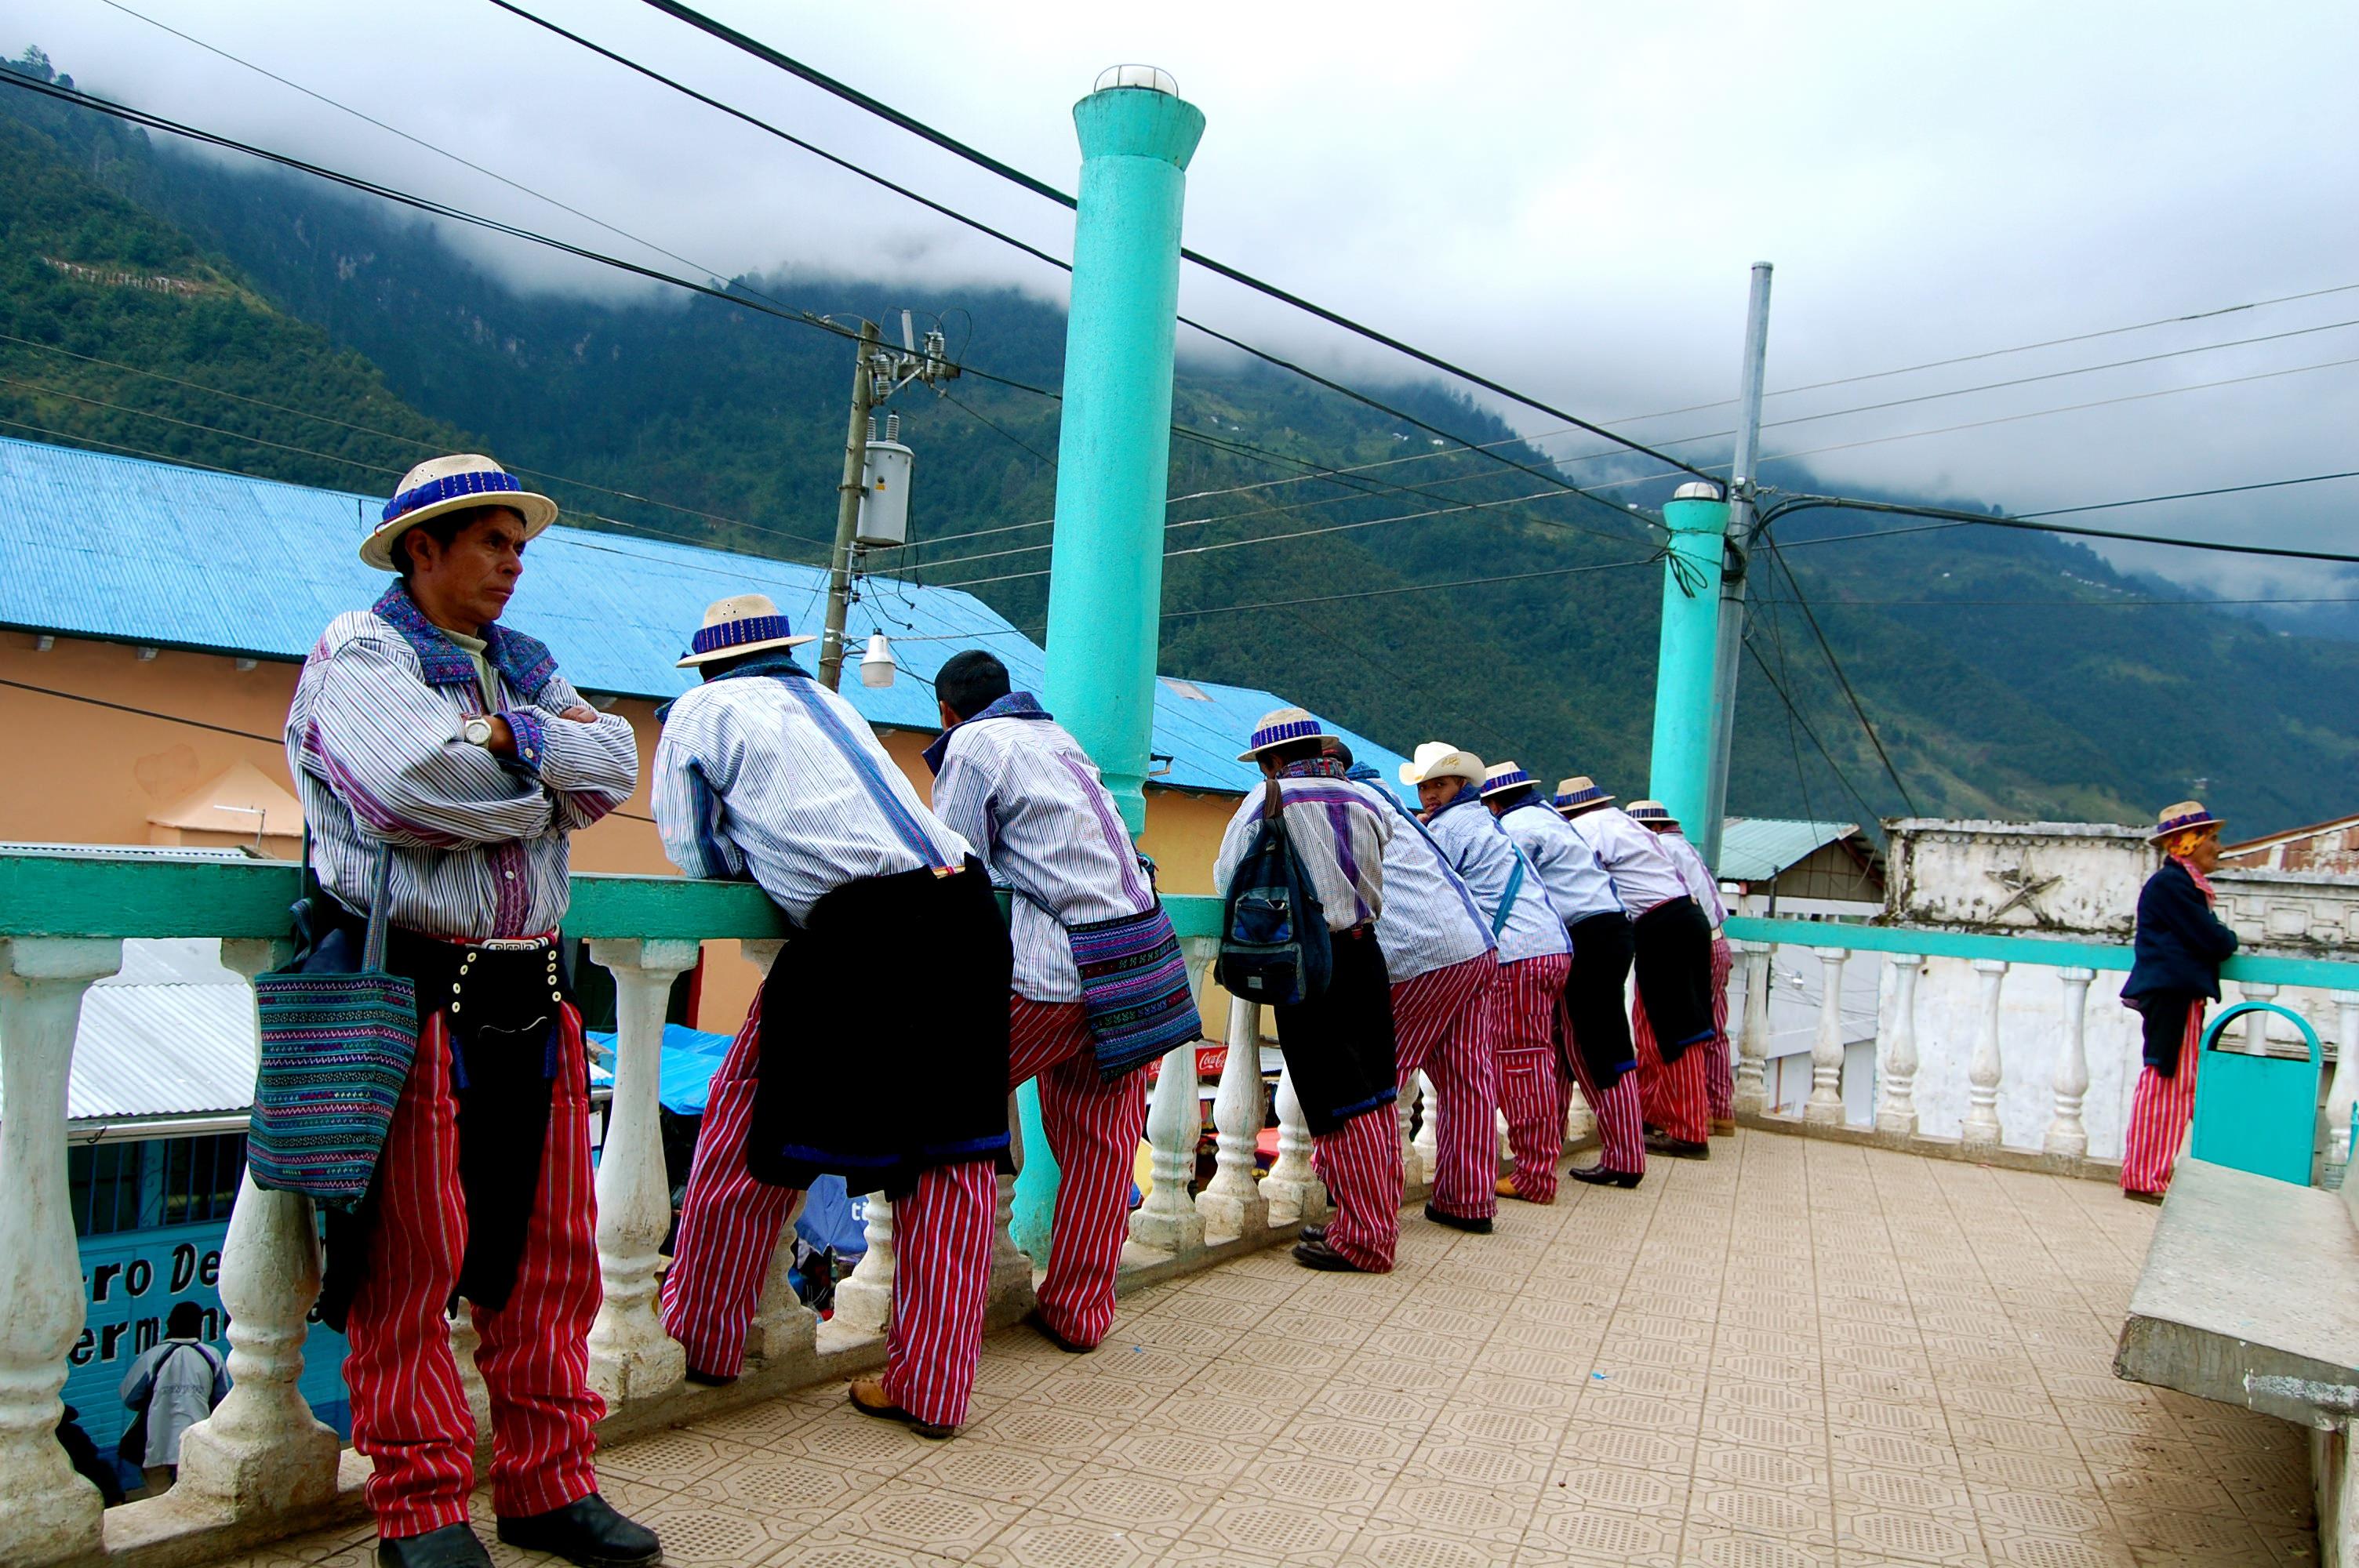 Men in traditional clothing in Todos Santos, Guatemala